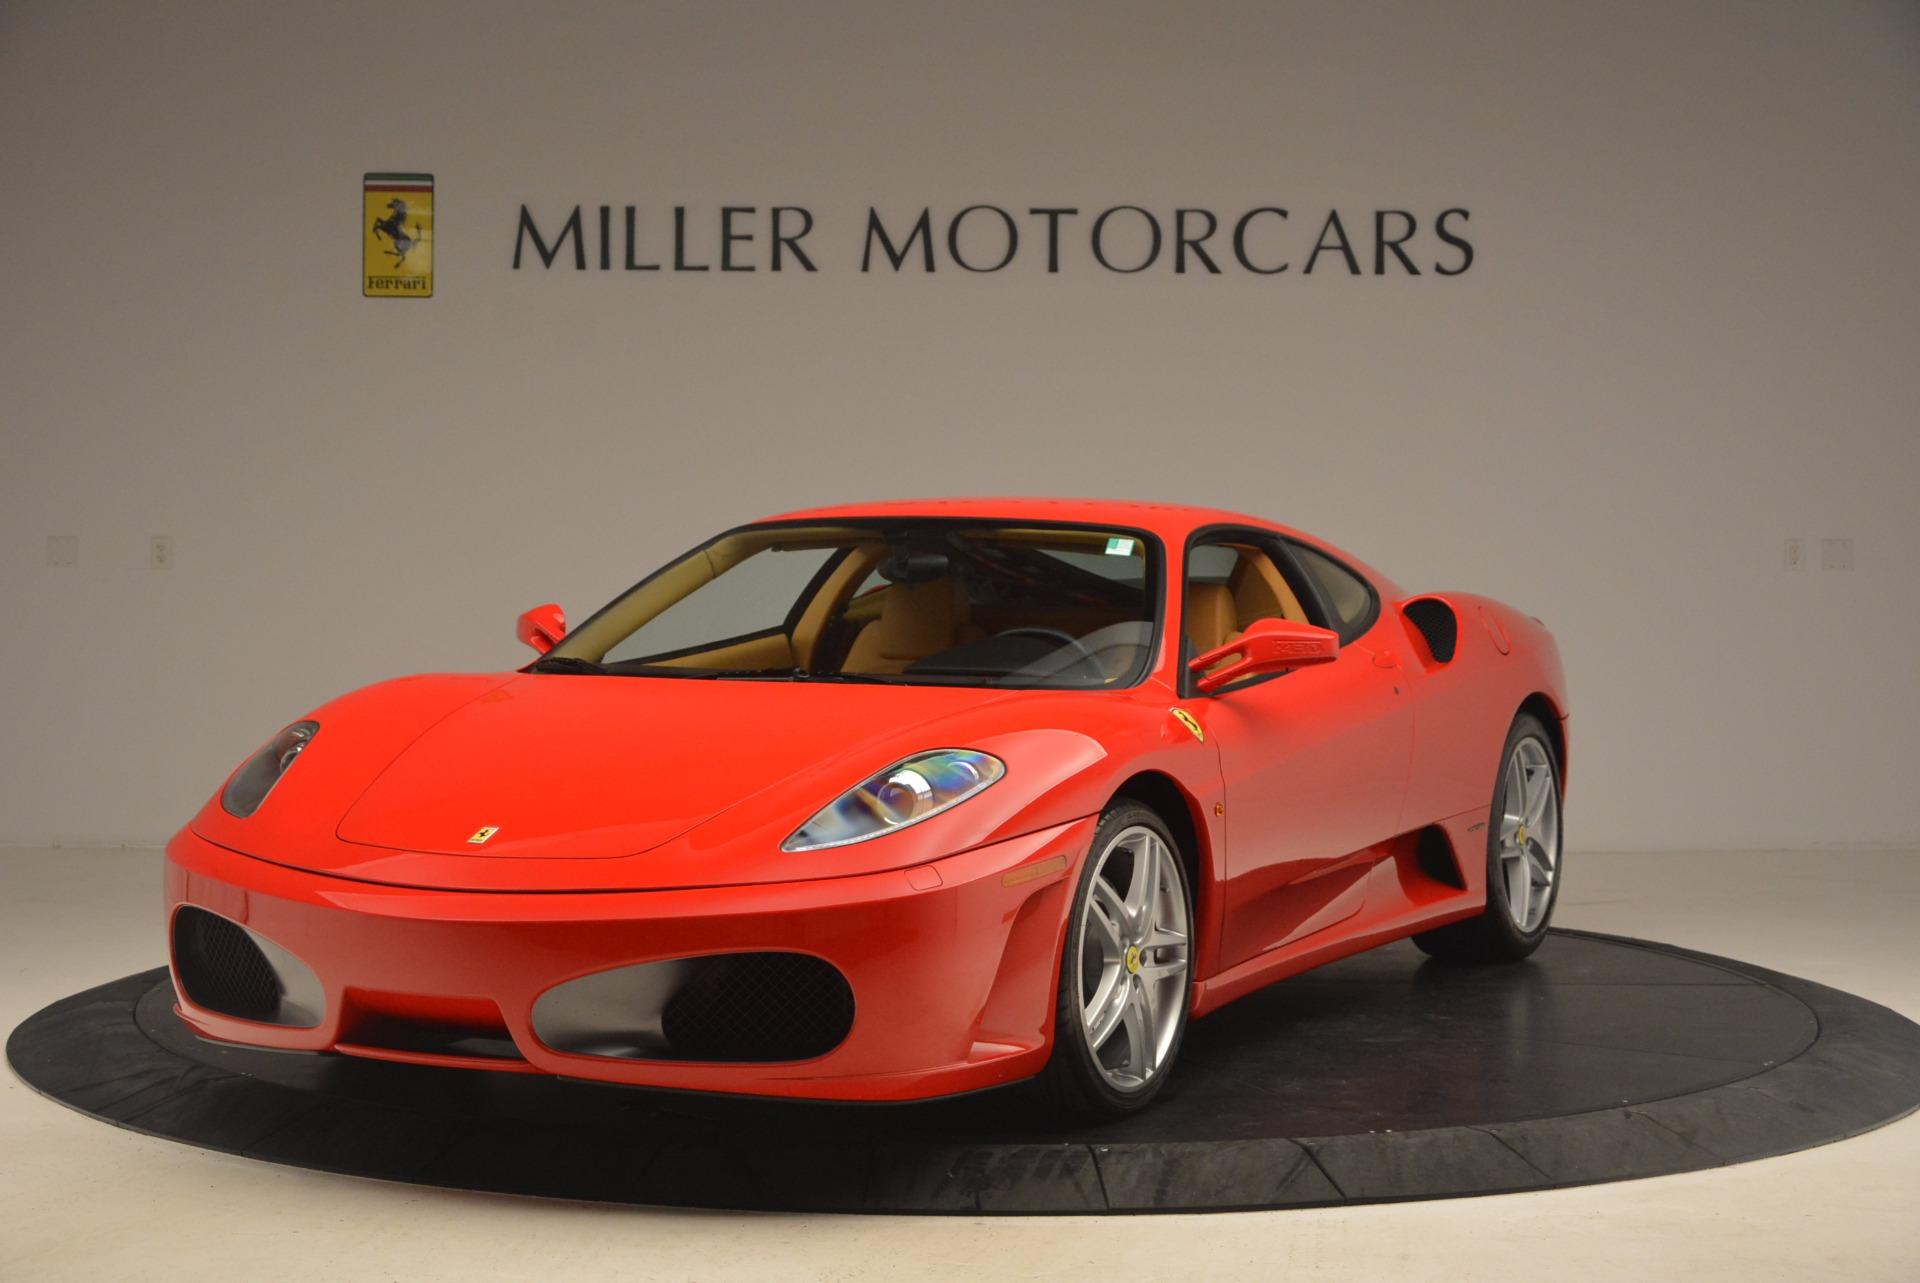 Used 2005 Ferrari F430 for sale Sold at Alfa Romeo of Greenwich in Greenwich CT 06830 1